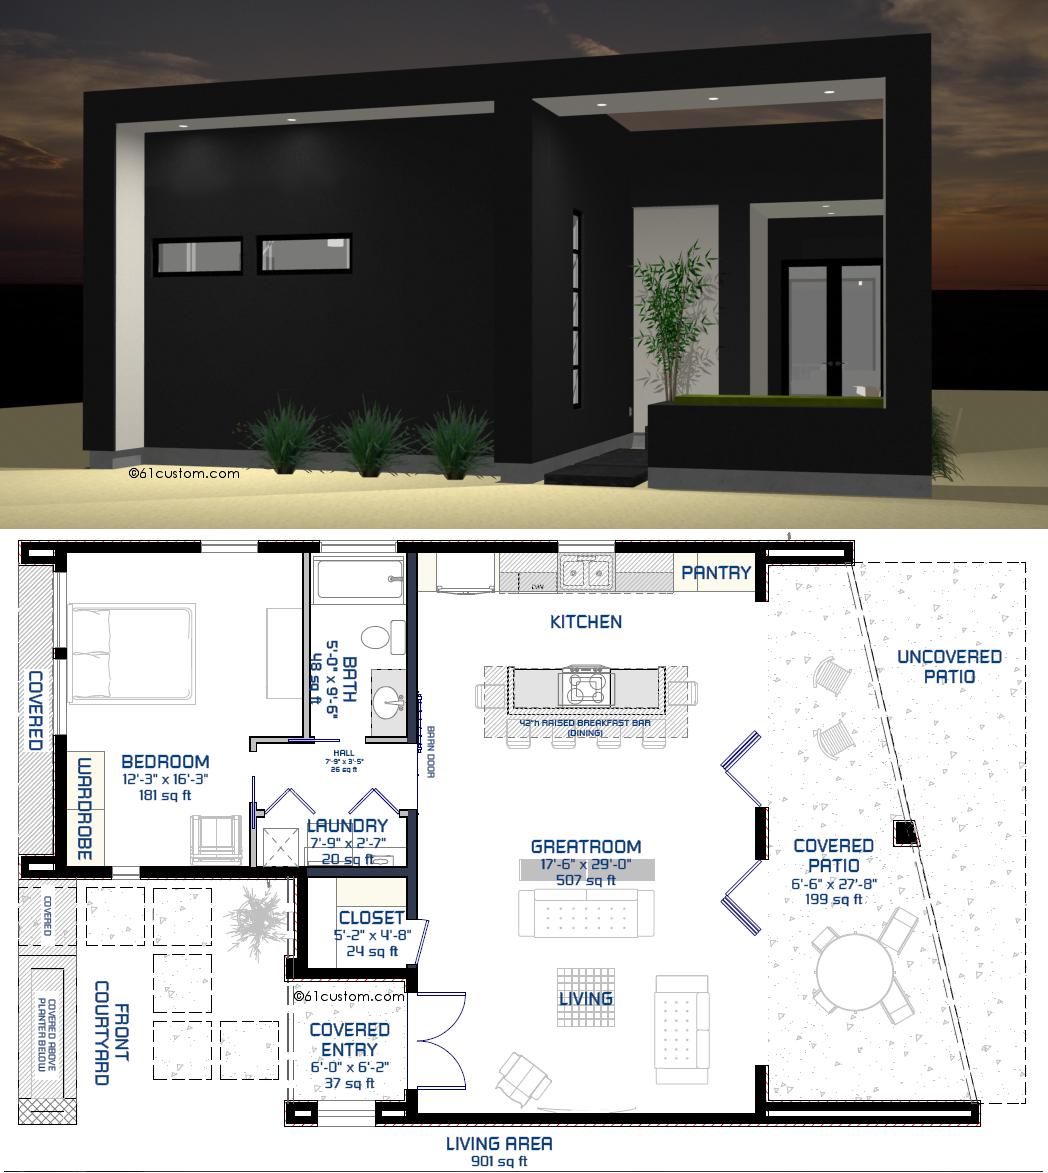 Small Modern Home Design Ideas 357: Small Modern Courtyard House Plan